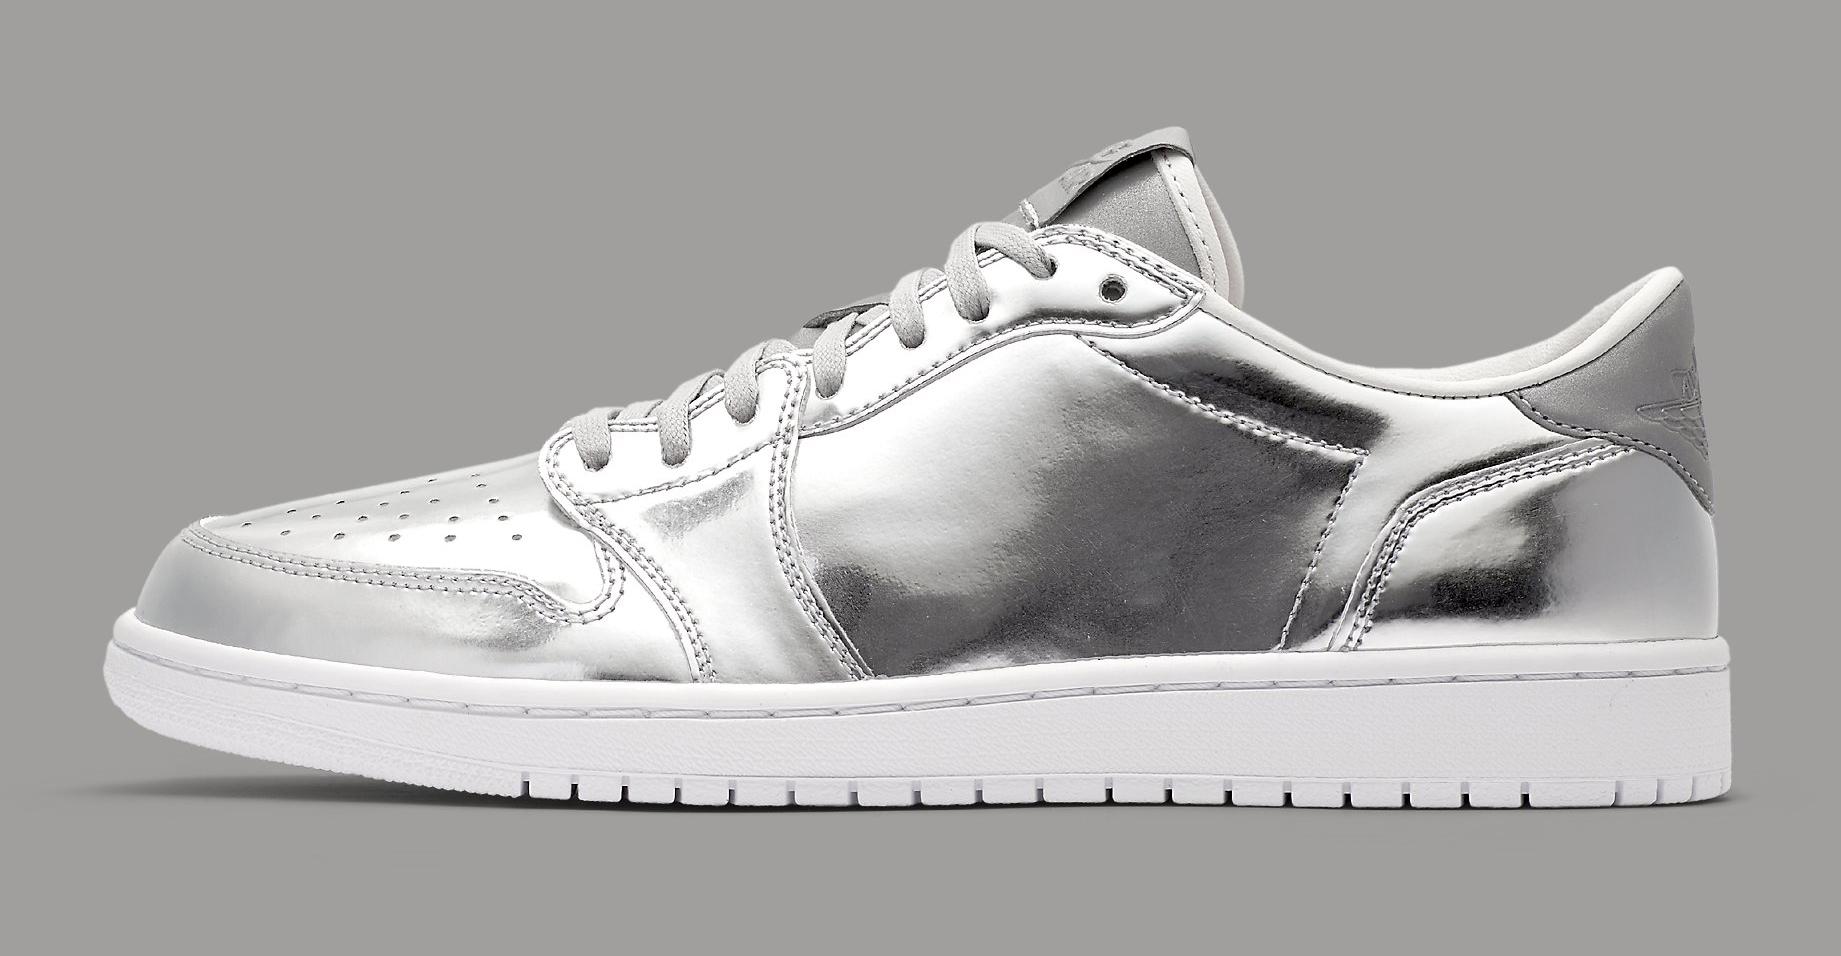 65a2383317c0b3 Pinnacle Air Jordan 1 Low Silver Release Date